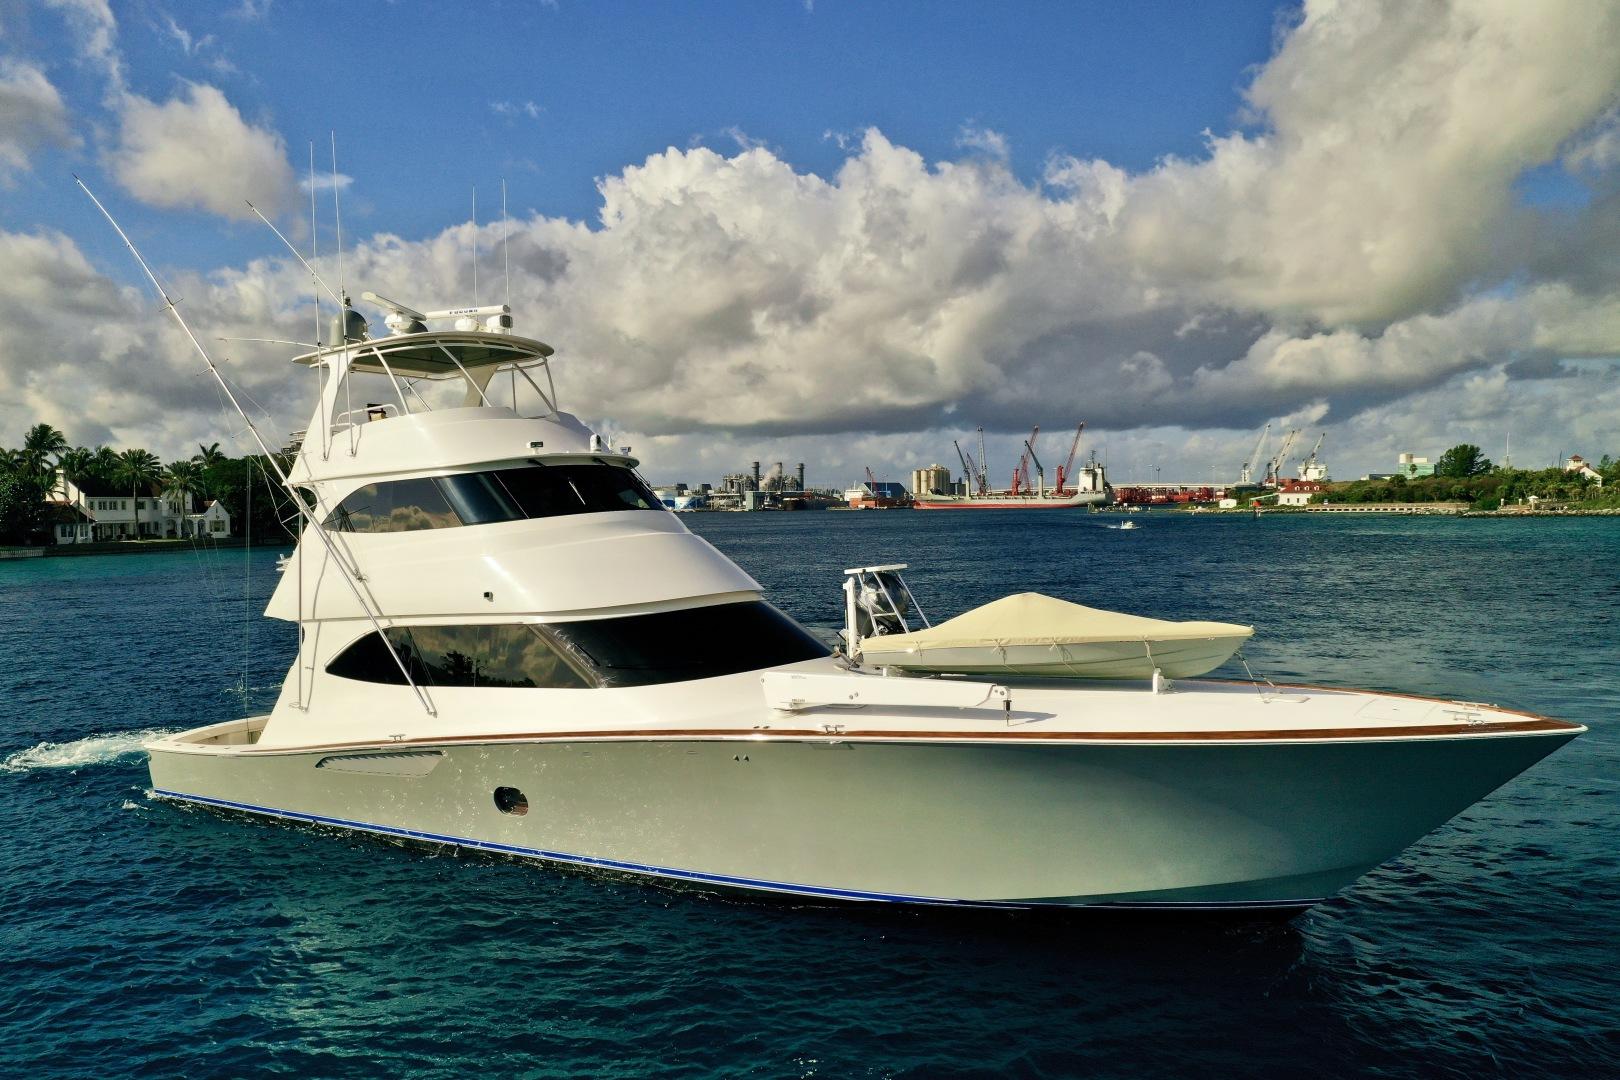 Viking-76 Convertible 2010-High Cotton Palm Beach-Florida-United States-2010 76 Viking Convertible   Starboard-1317946 | Thumbnail